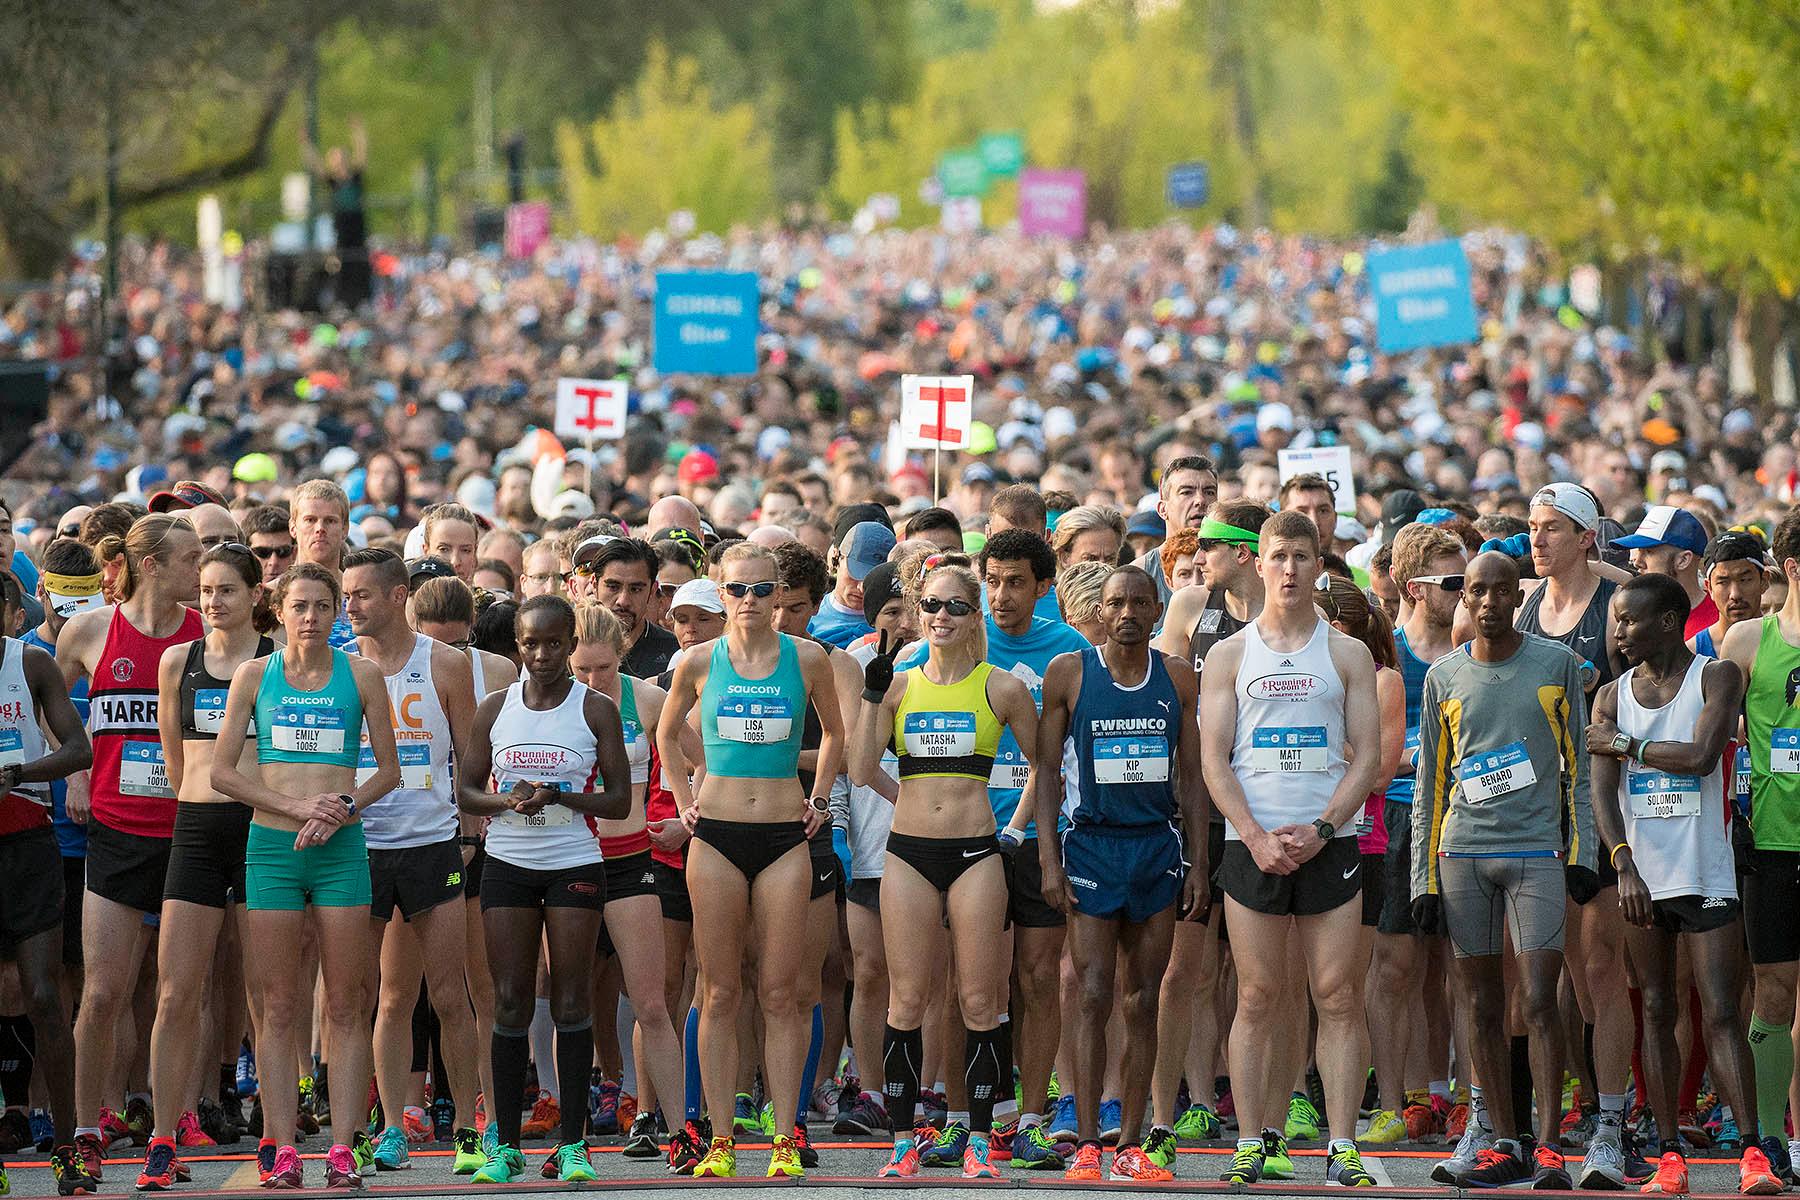 2017 bmo vancouver marathon photos bmo vancouver marathon